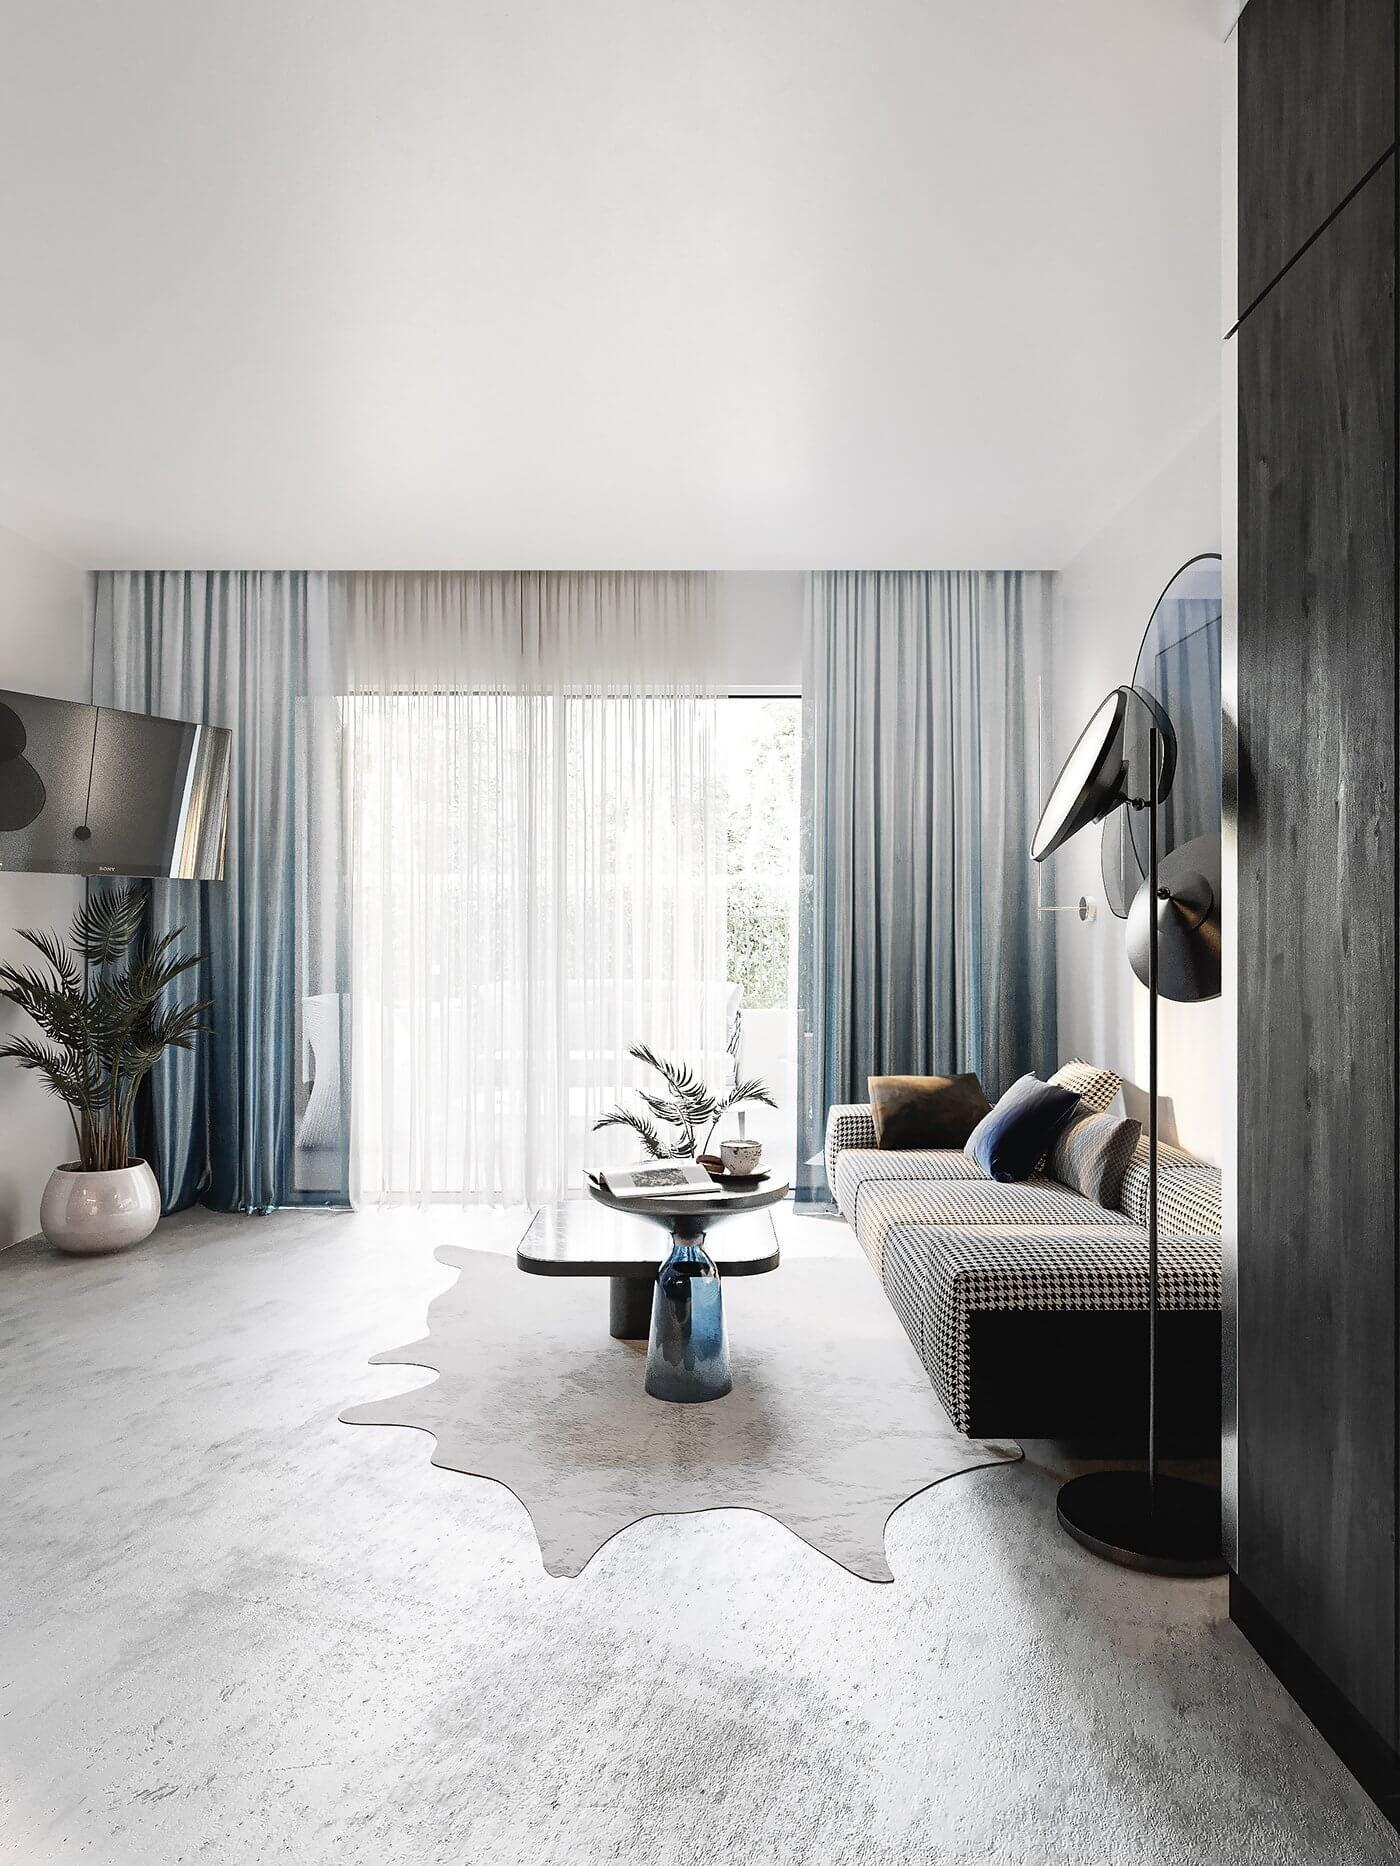 Autodesk Room Design: Stylish Cannes Apartment Design // Cgi Visualization In